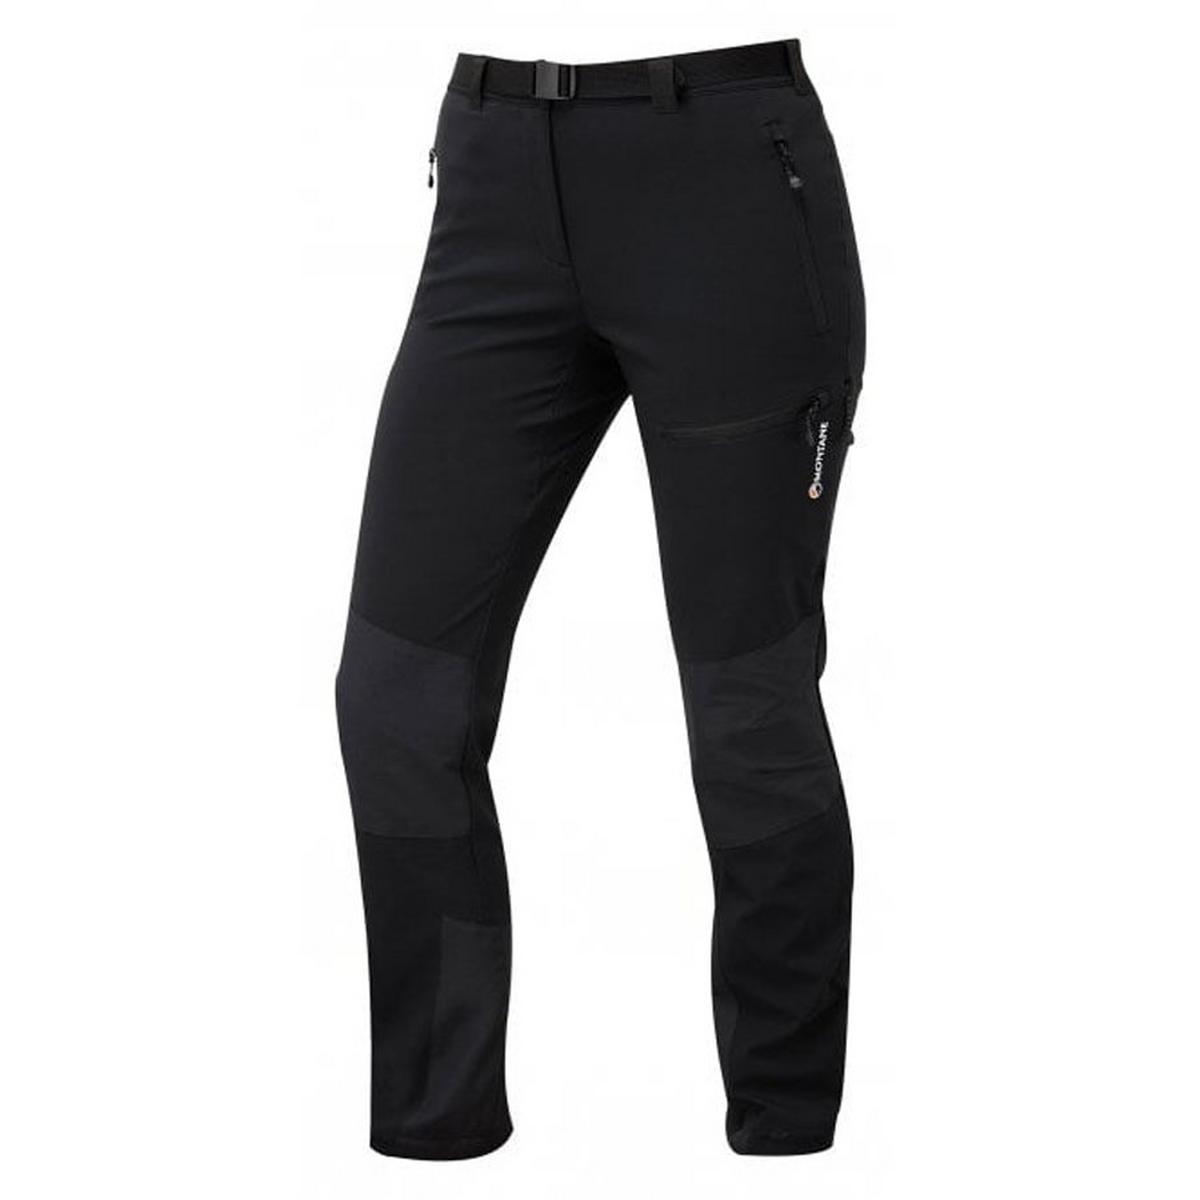 Montane Women's Terra Mission Pants - Black